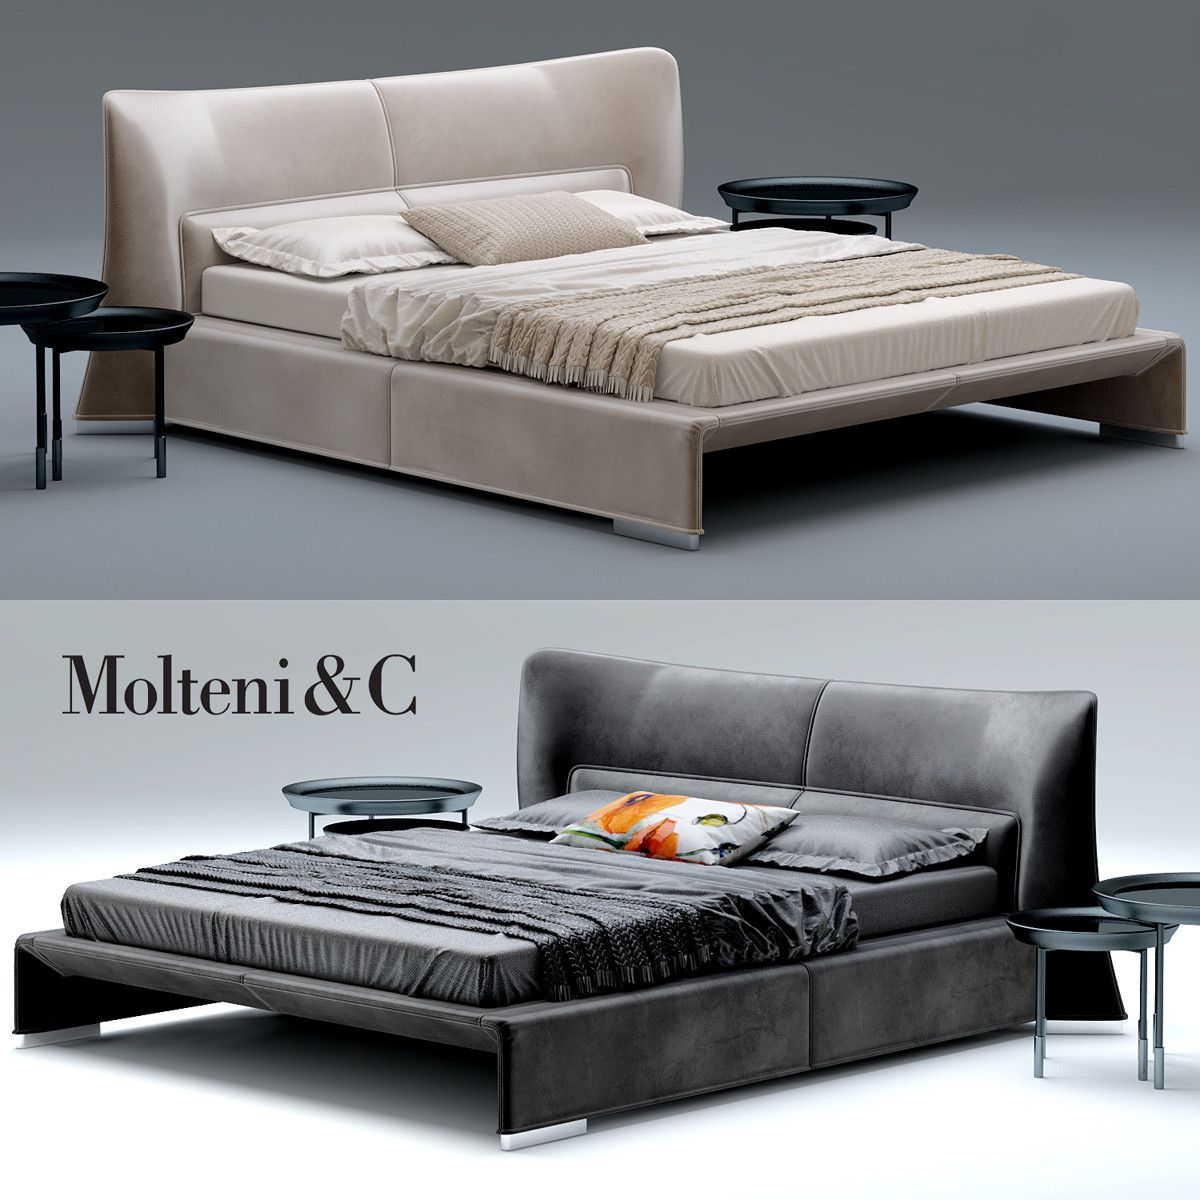 3d glove bed molteni model camas de disea o milimslista pinterest